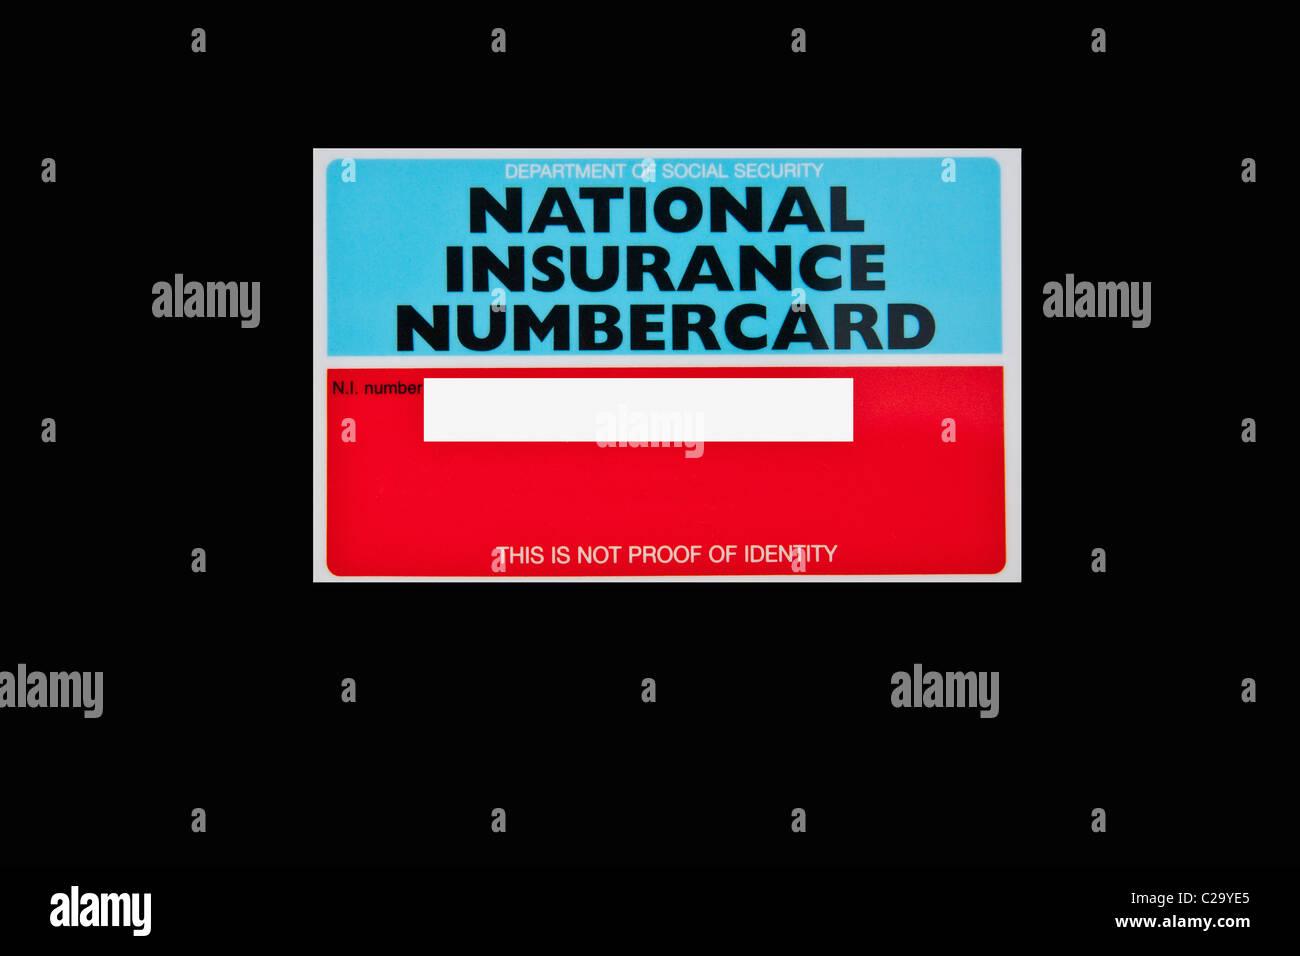 National Insurance Card Stock Photo Alamy